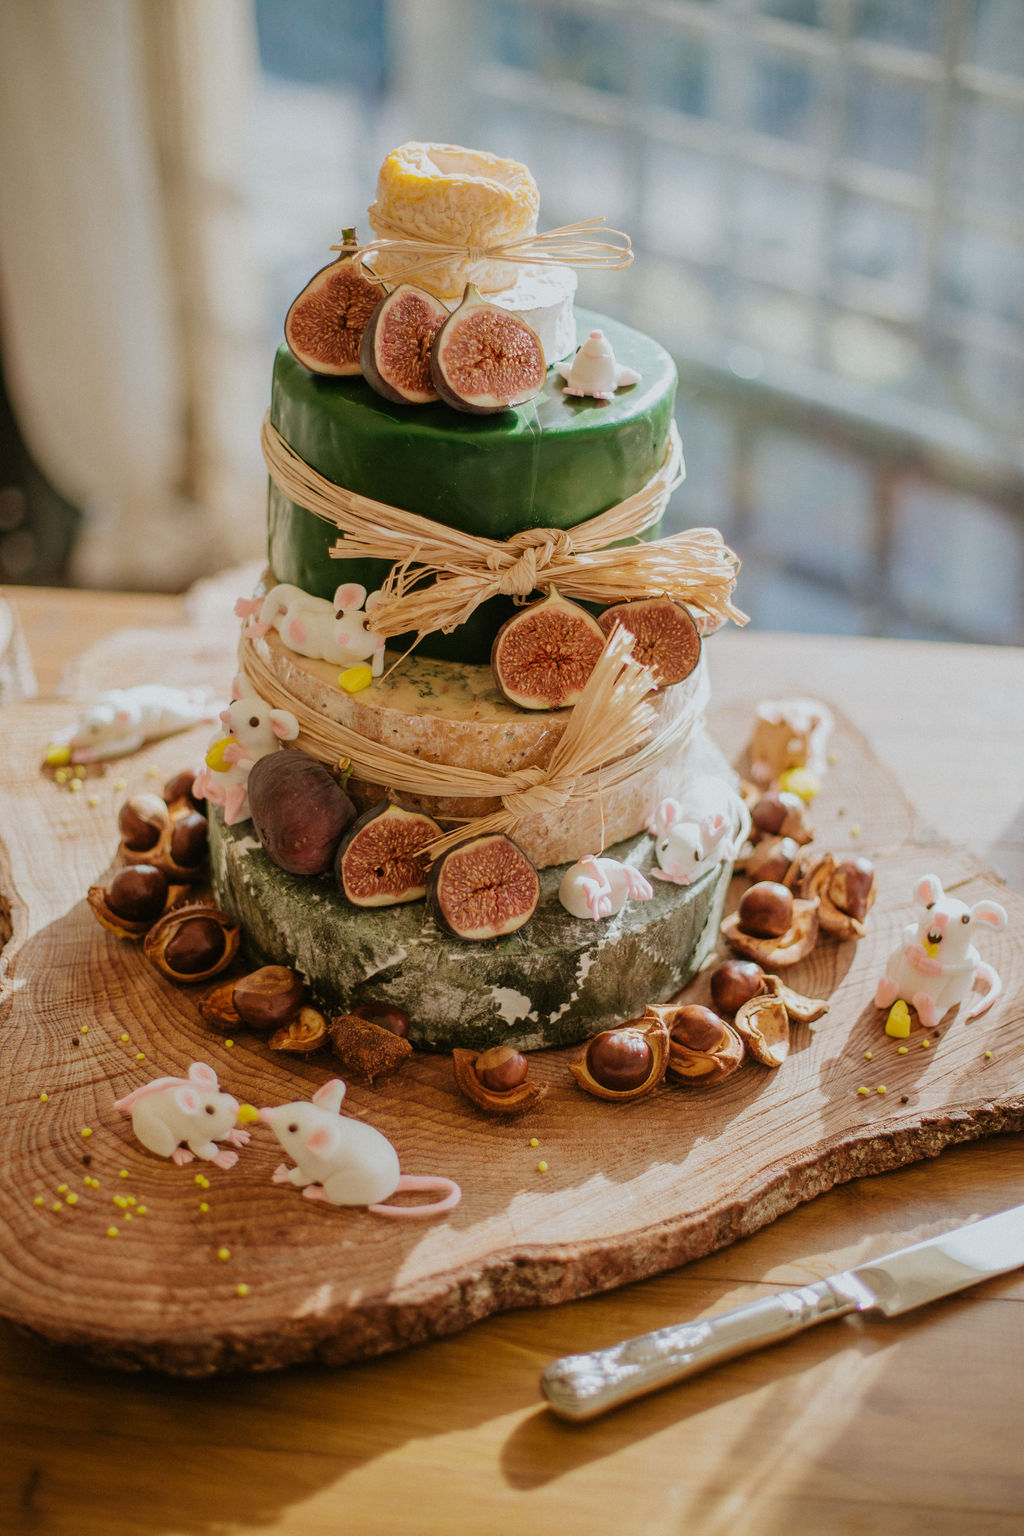 Original Wedding Cheese cake with fun mice | Kilted Frog Delicatessen